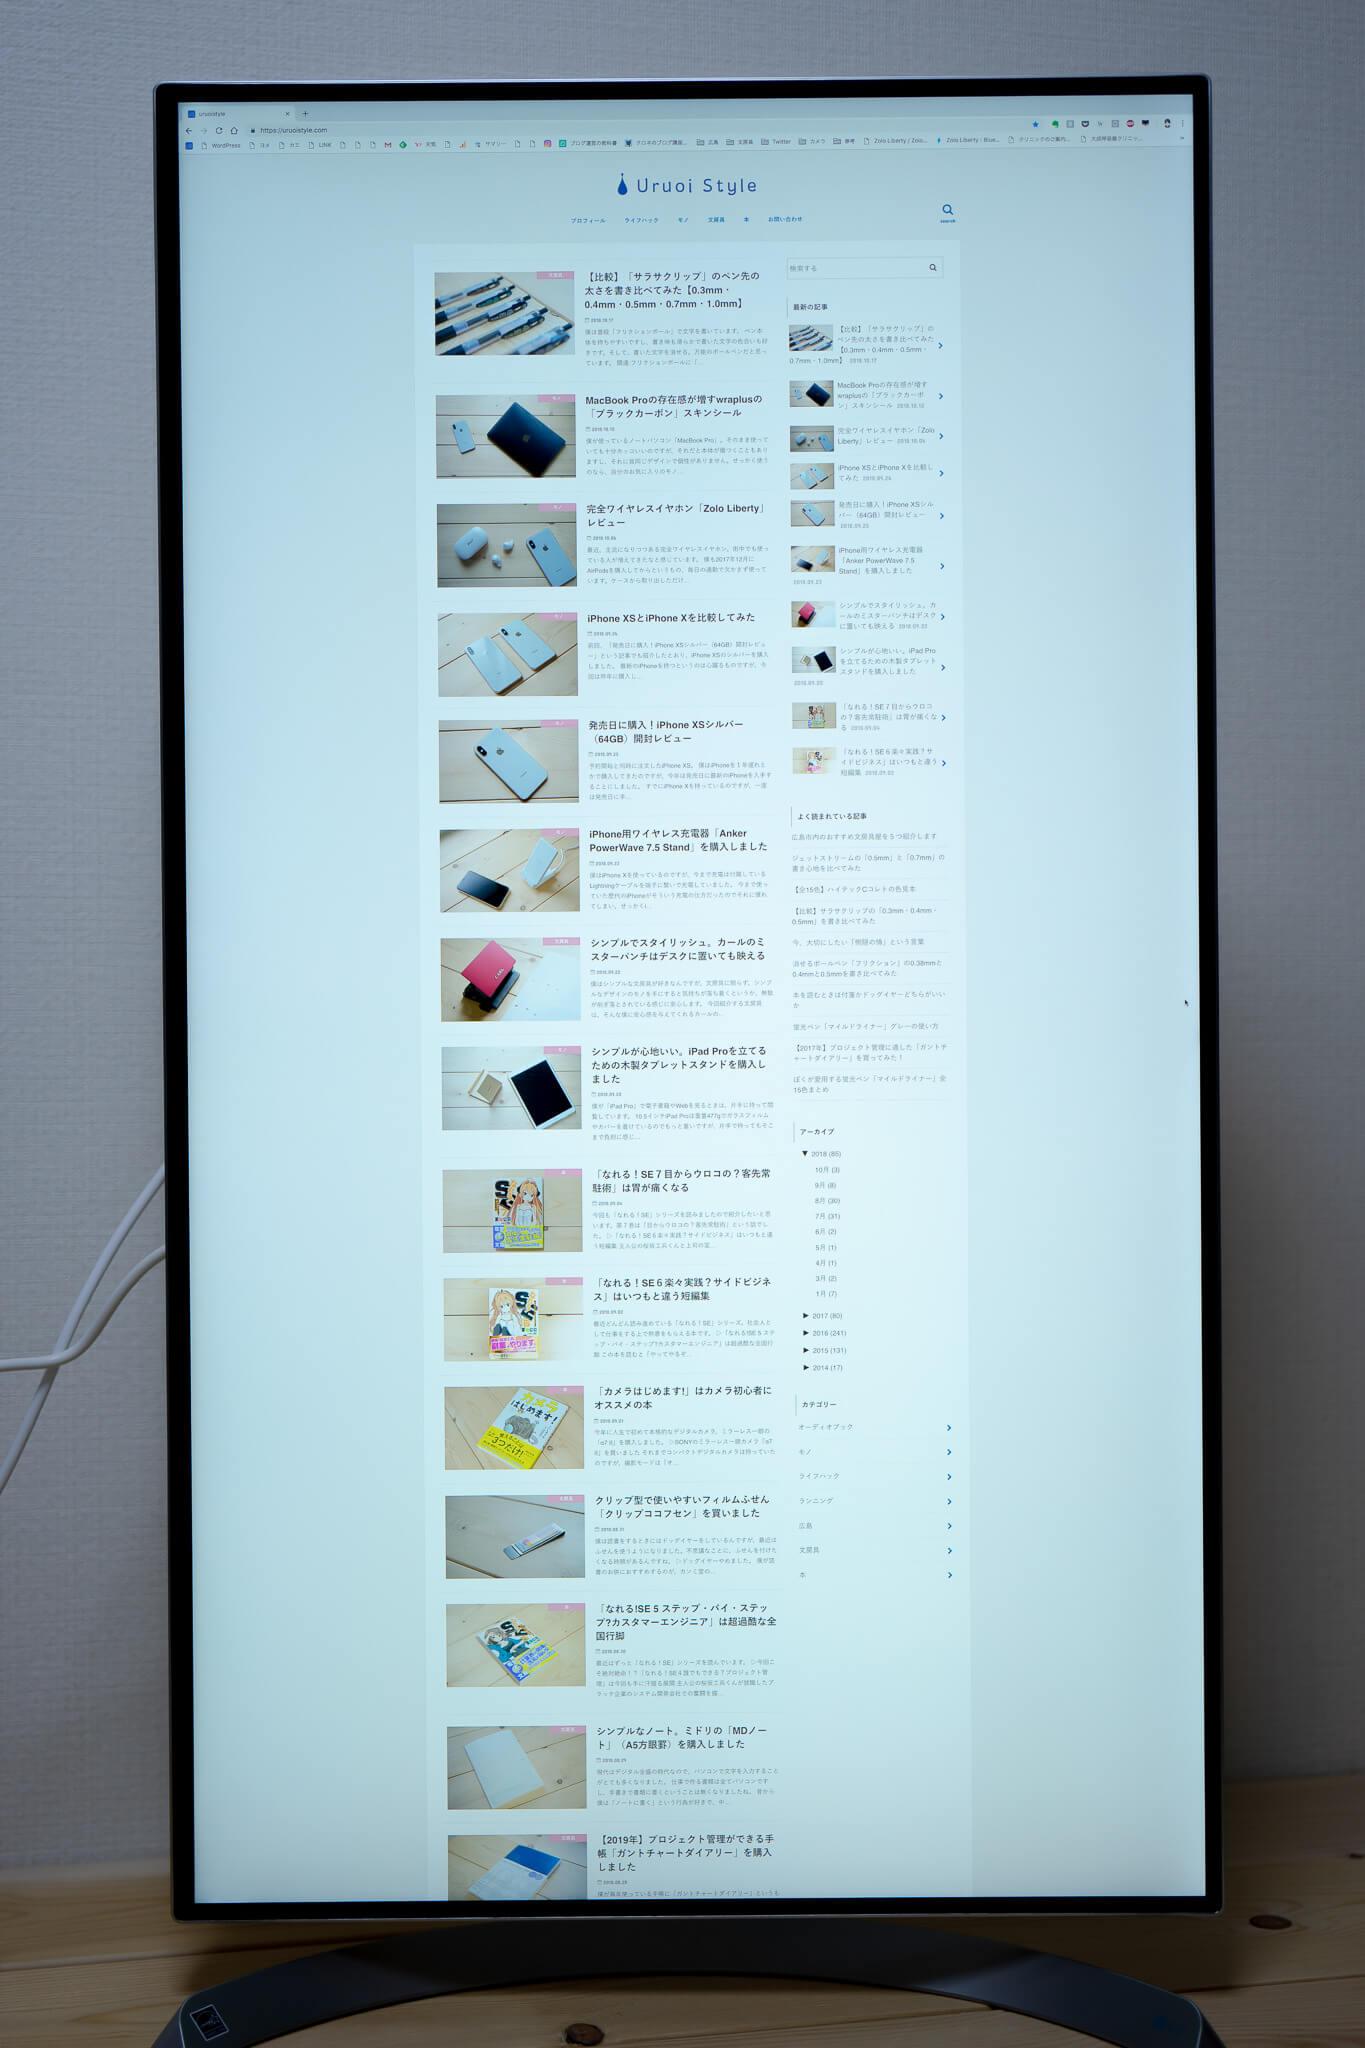 181021 lg display 32ud99w 24